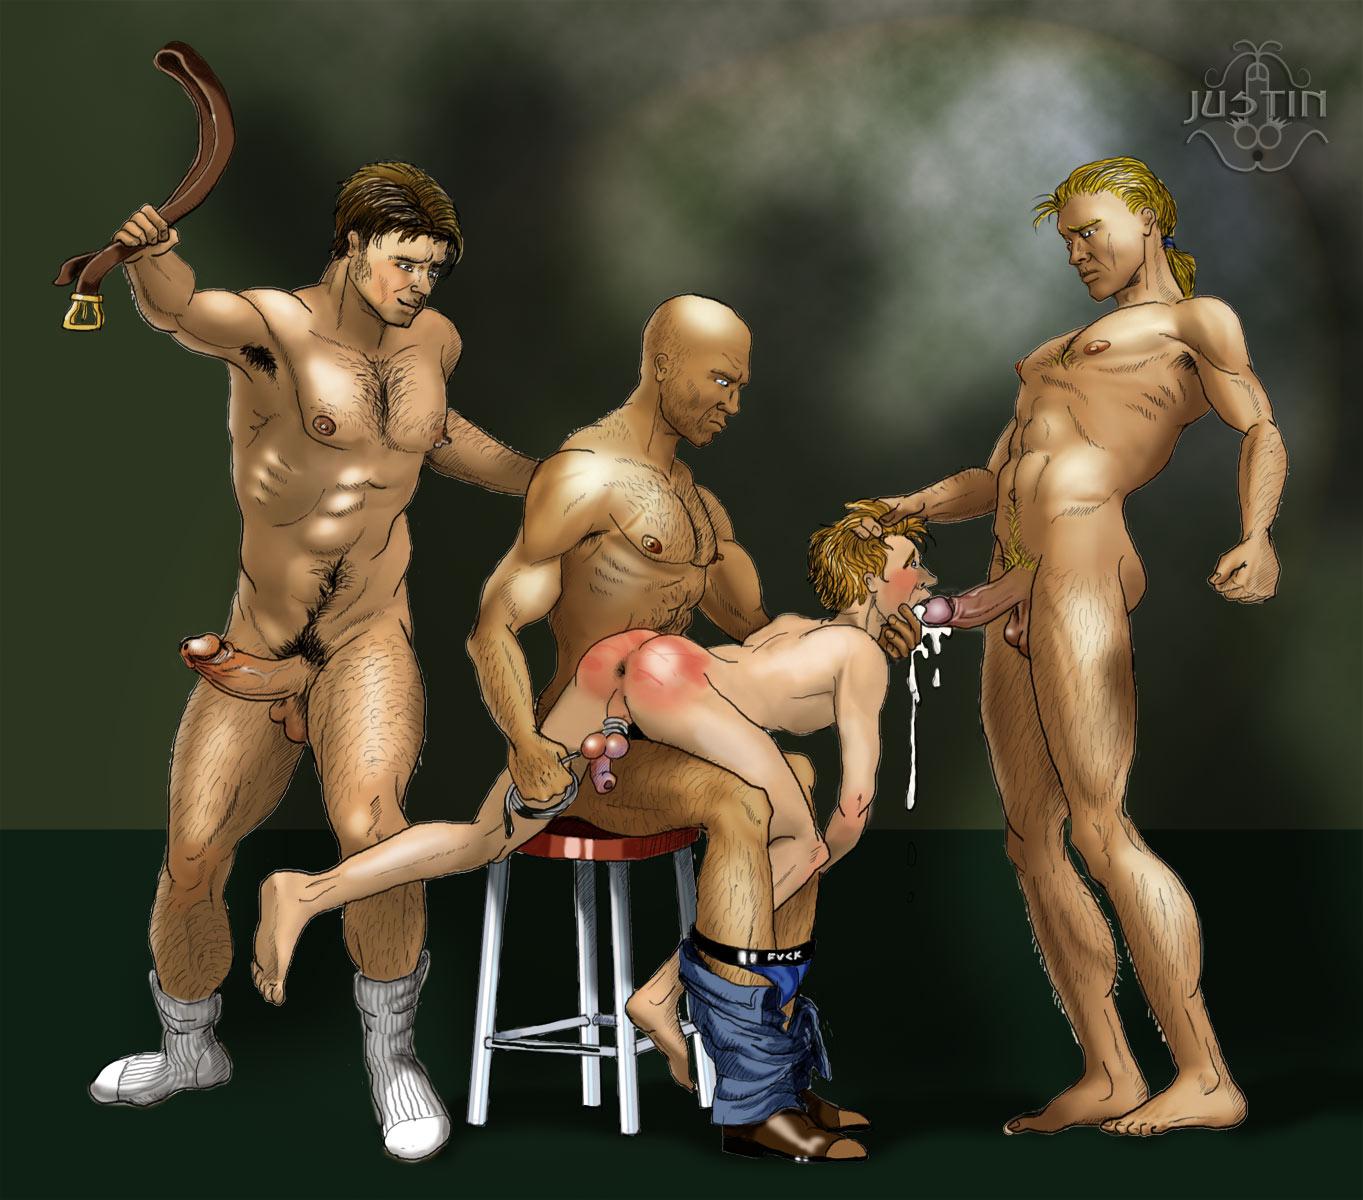 Fora do convencional Gay